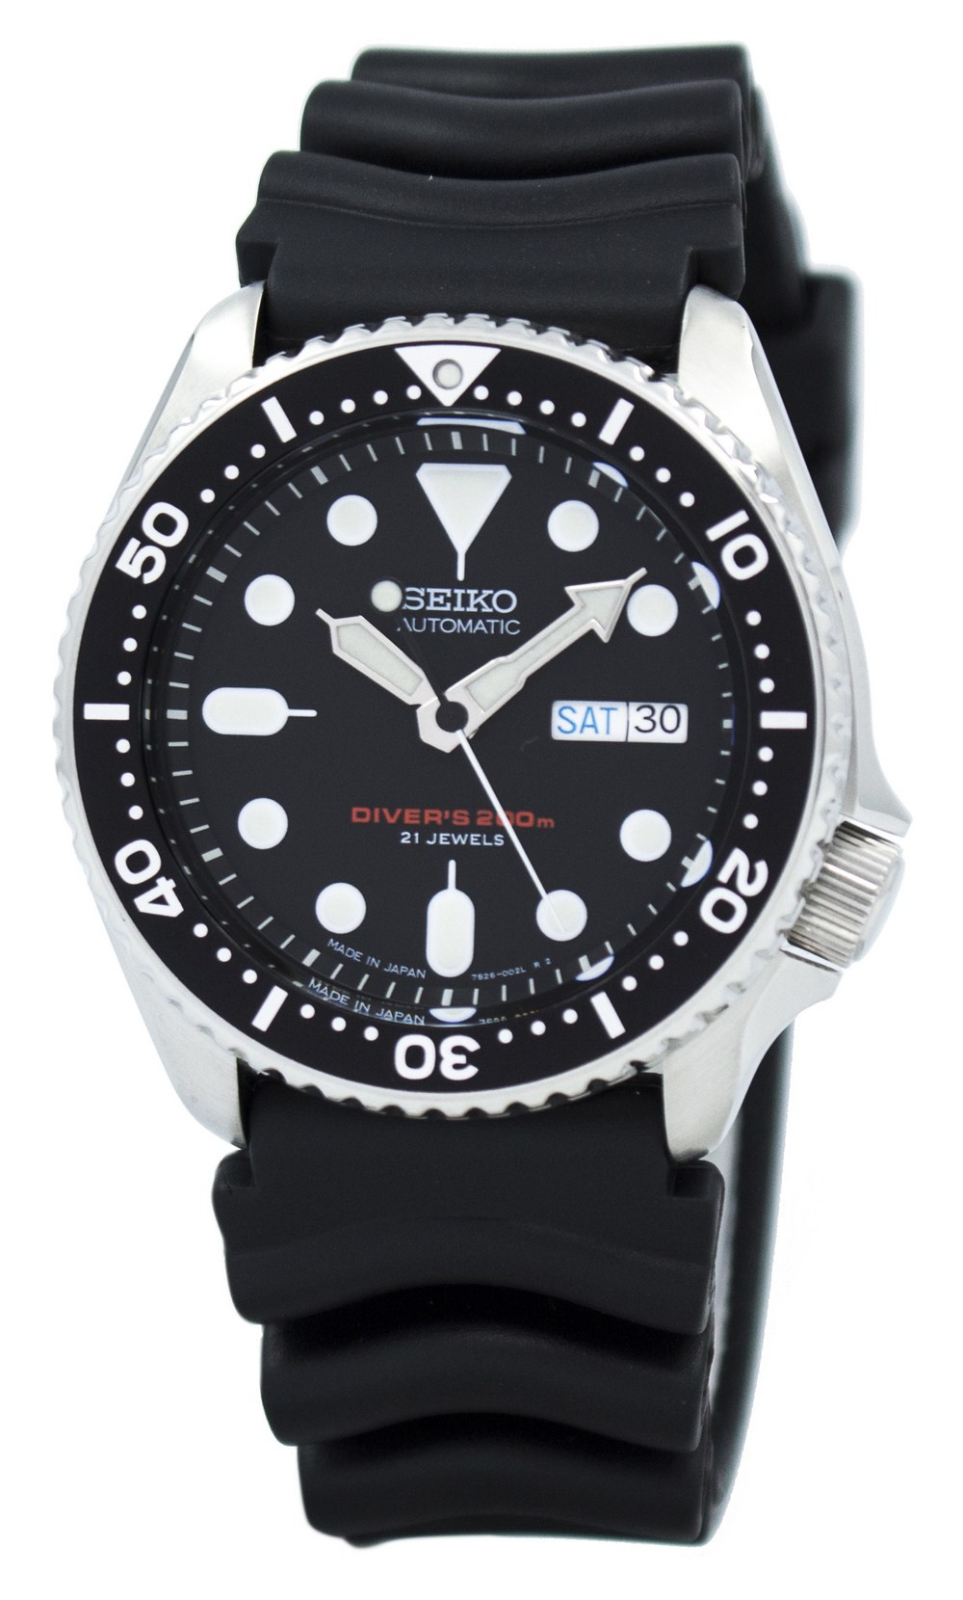 Seiko SKX007J1 Japan Diver Automatic Sport Men's Watch